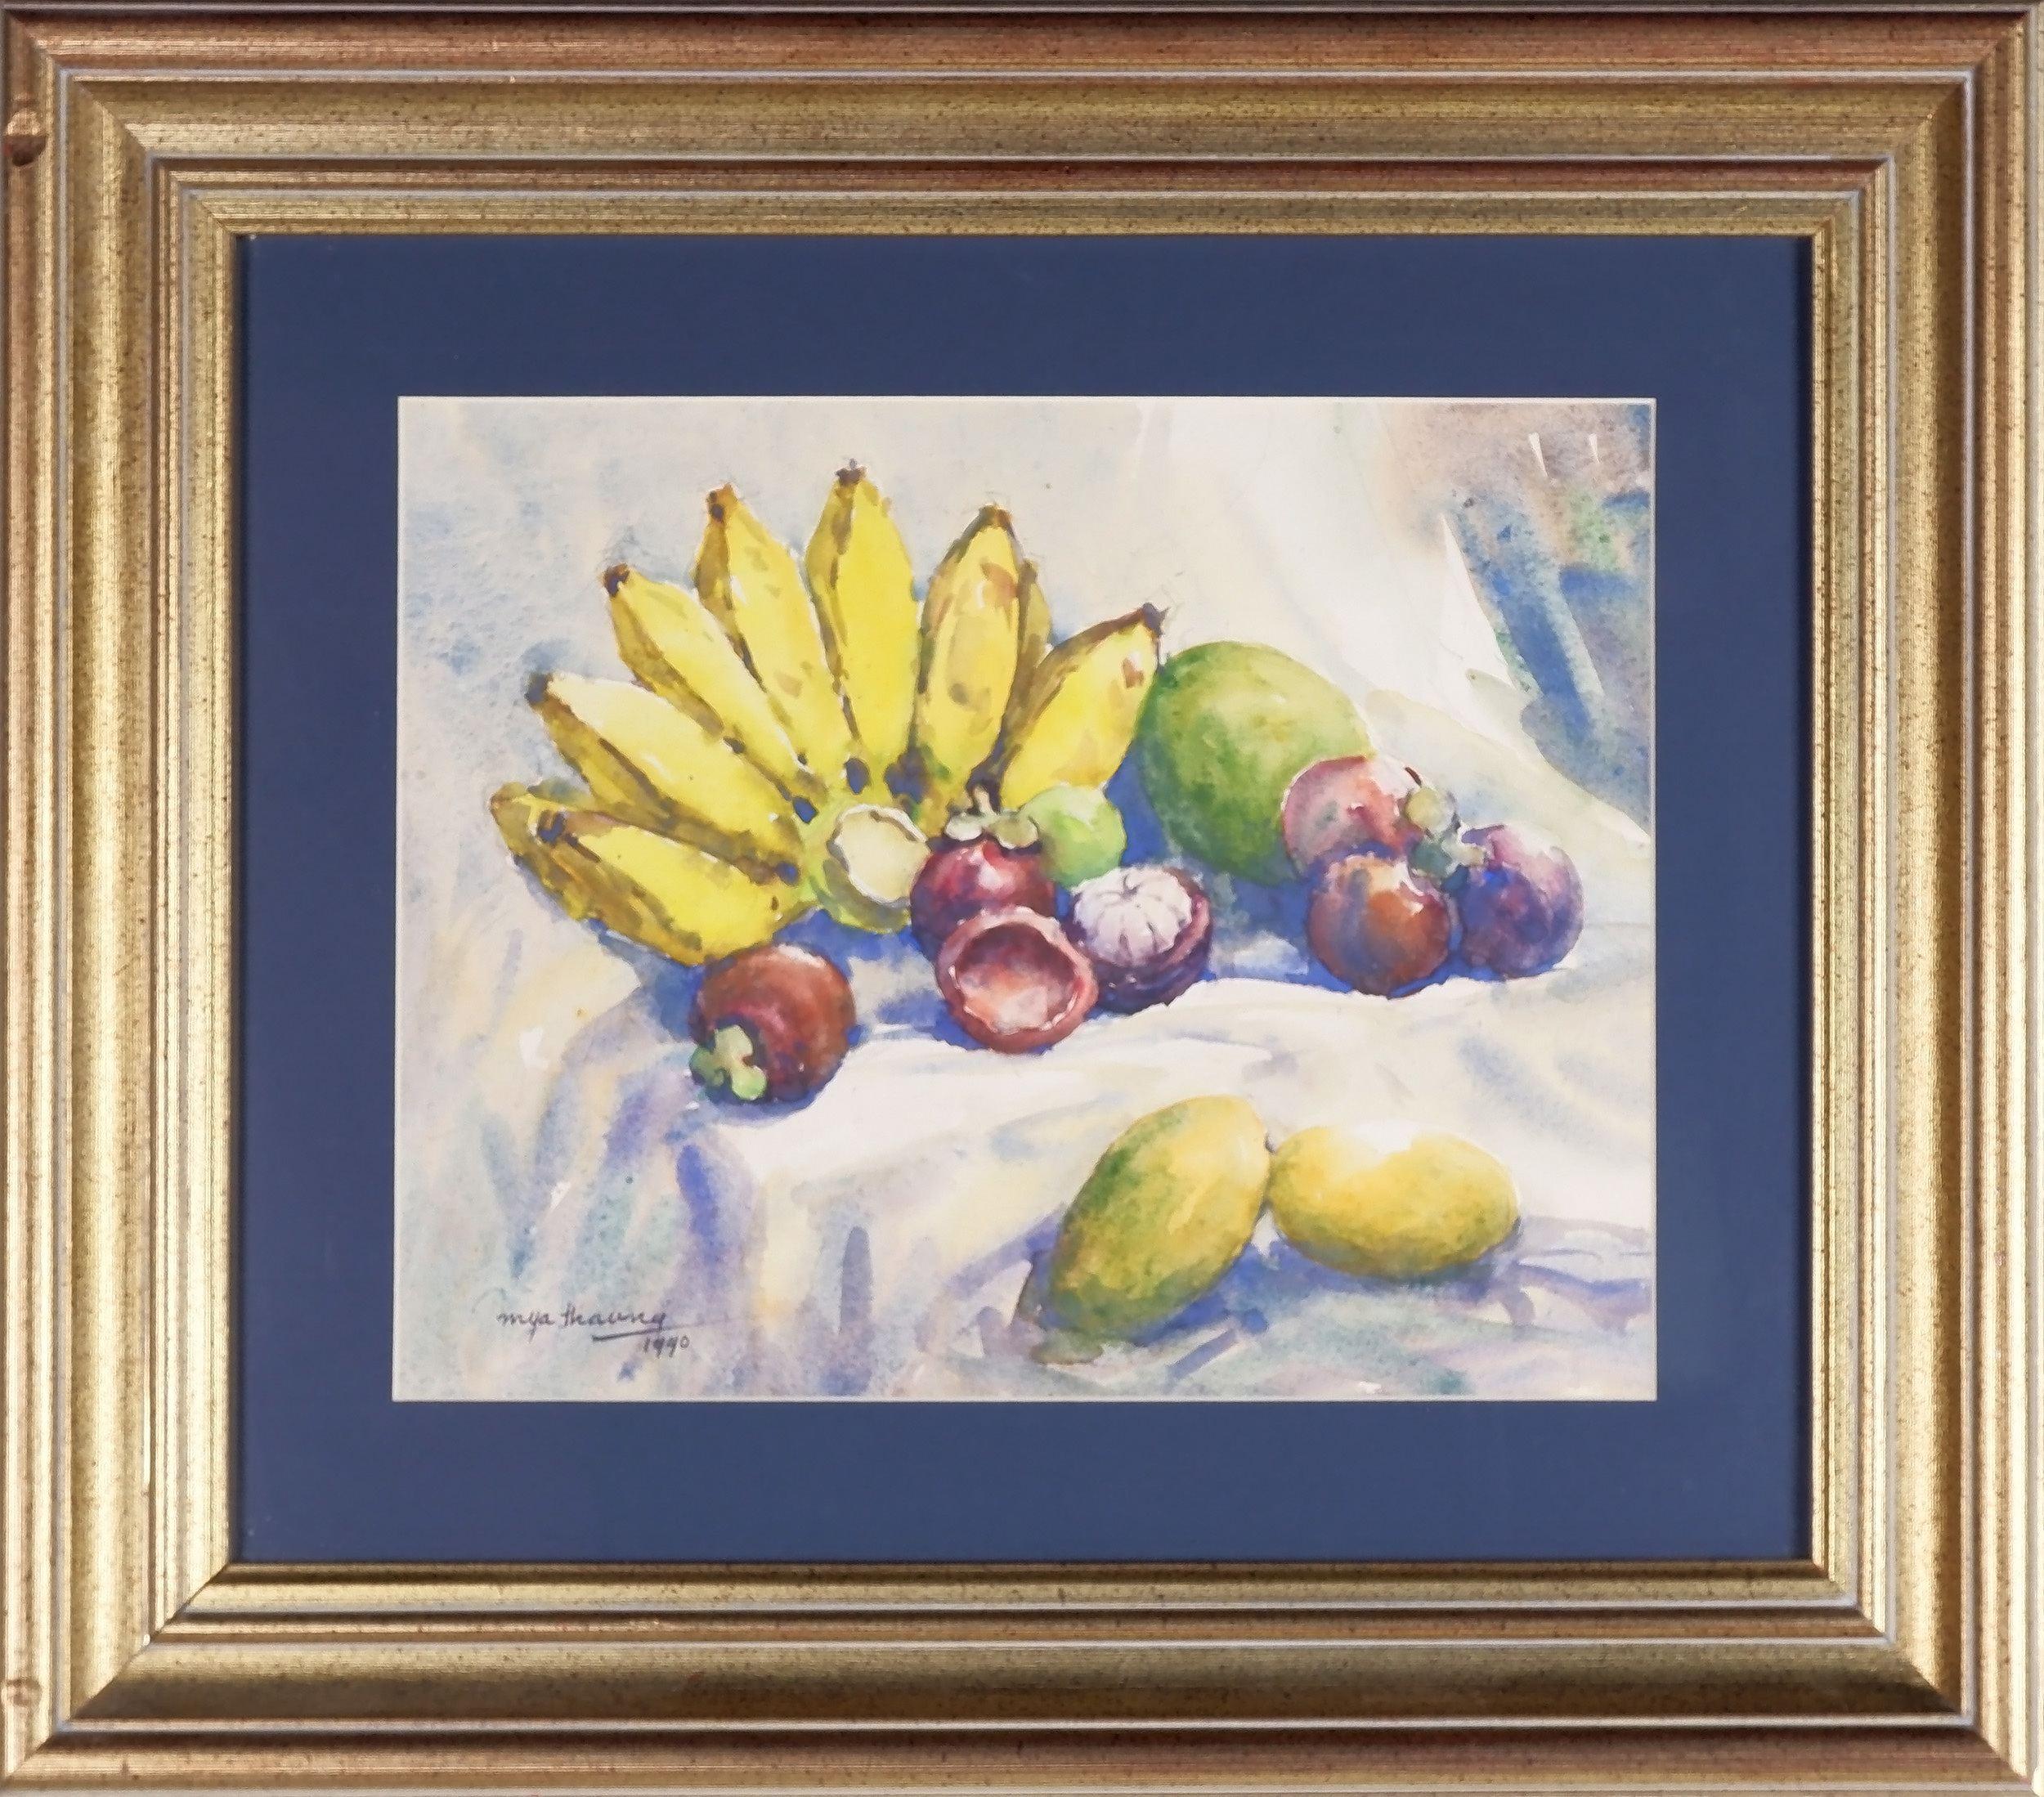 'Mya Thaung (Burmese 1943-) Fruits 1990, Watercolour'